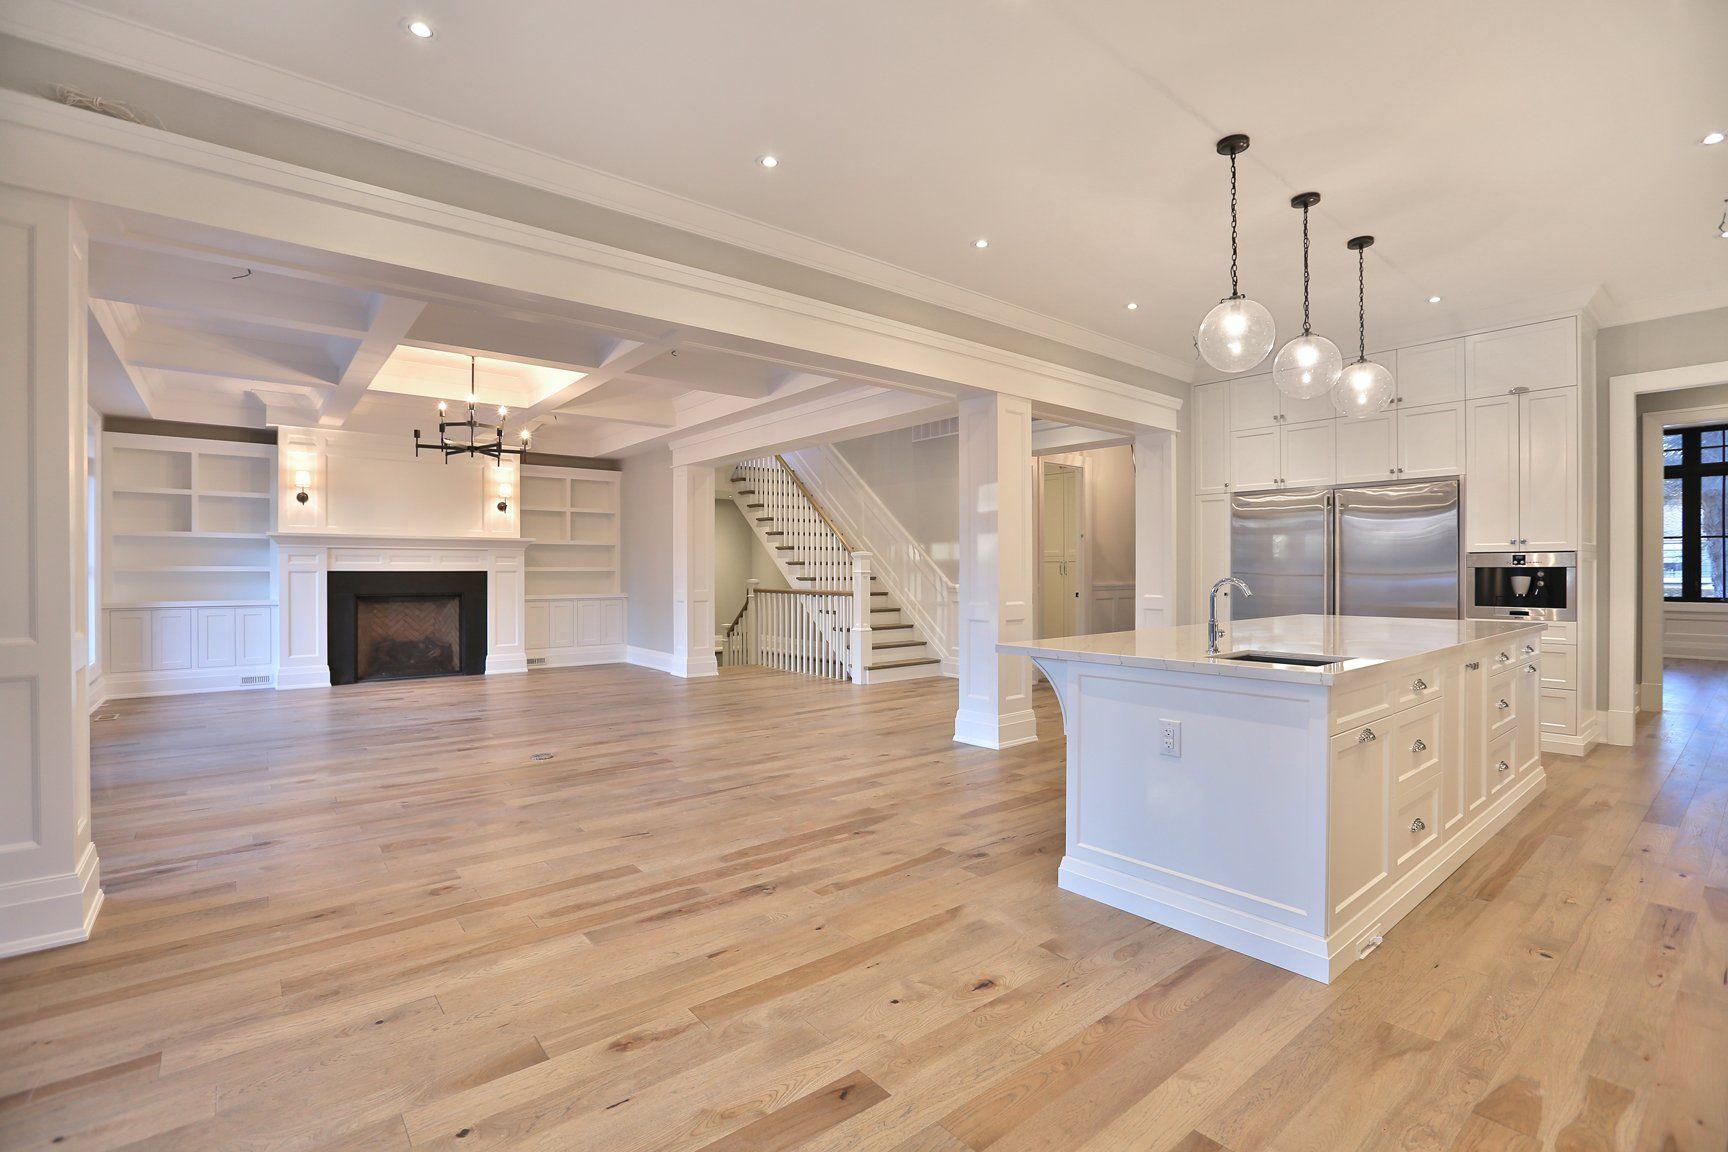 Alair Homes Burlington Poplar Drive 5 300 Sqft This 5